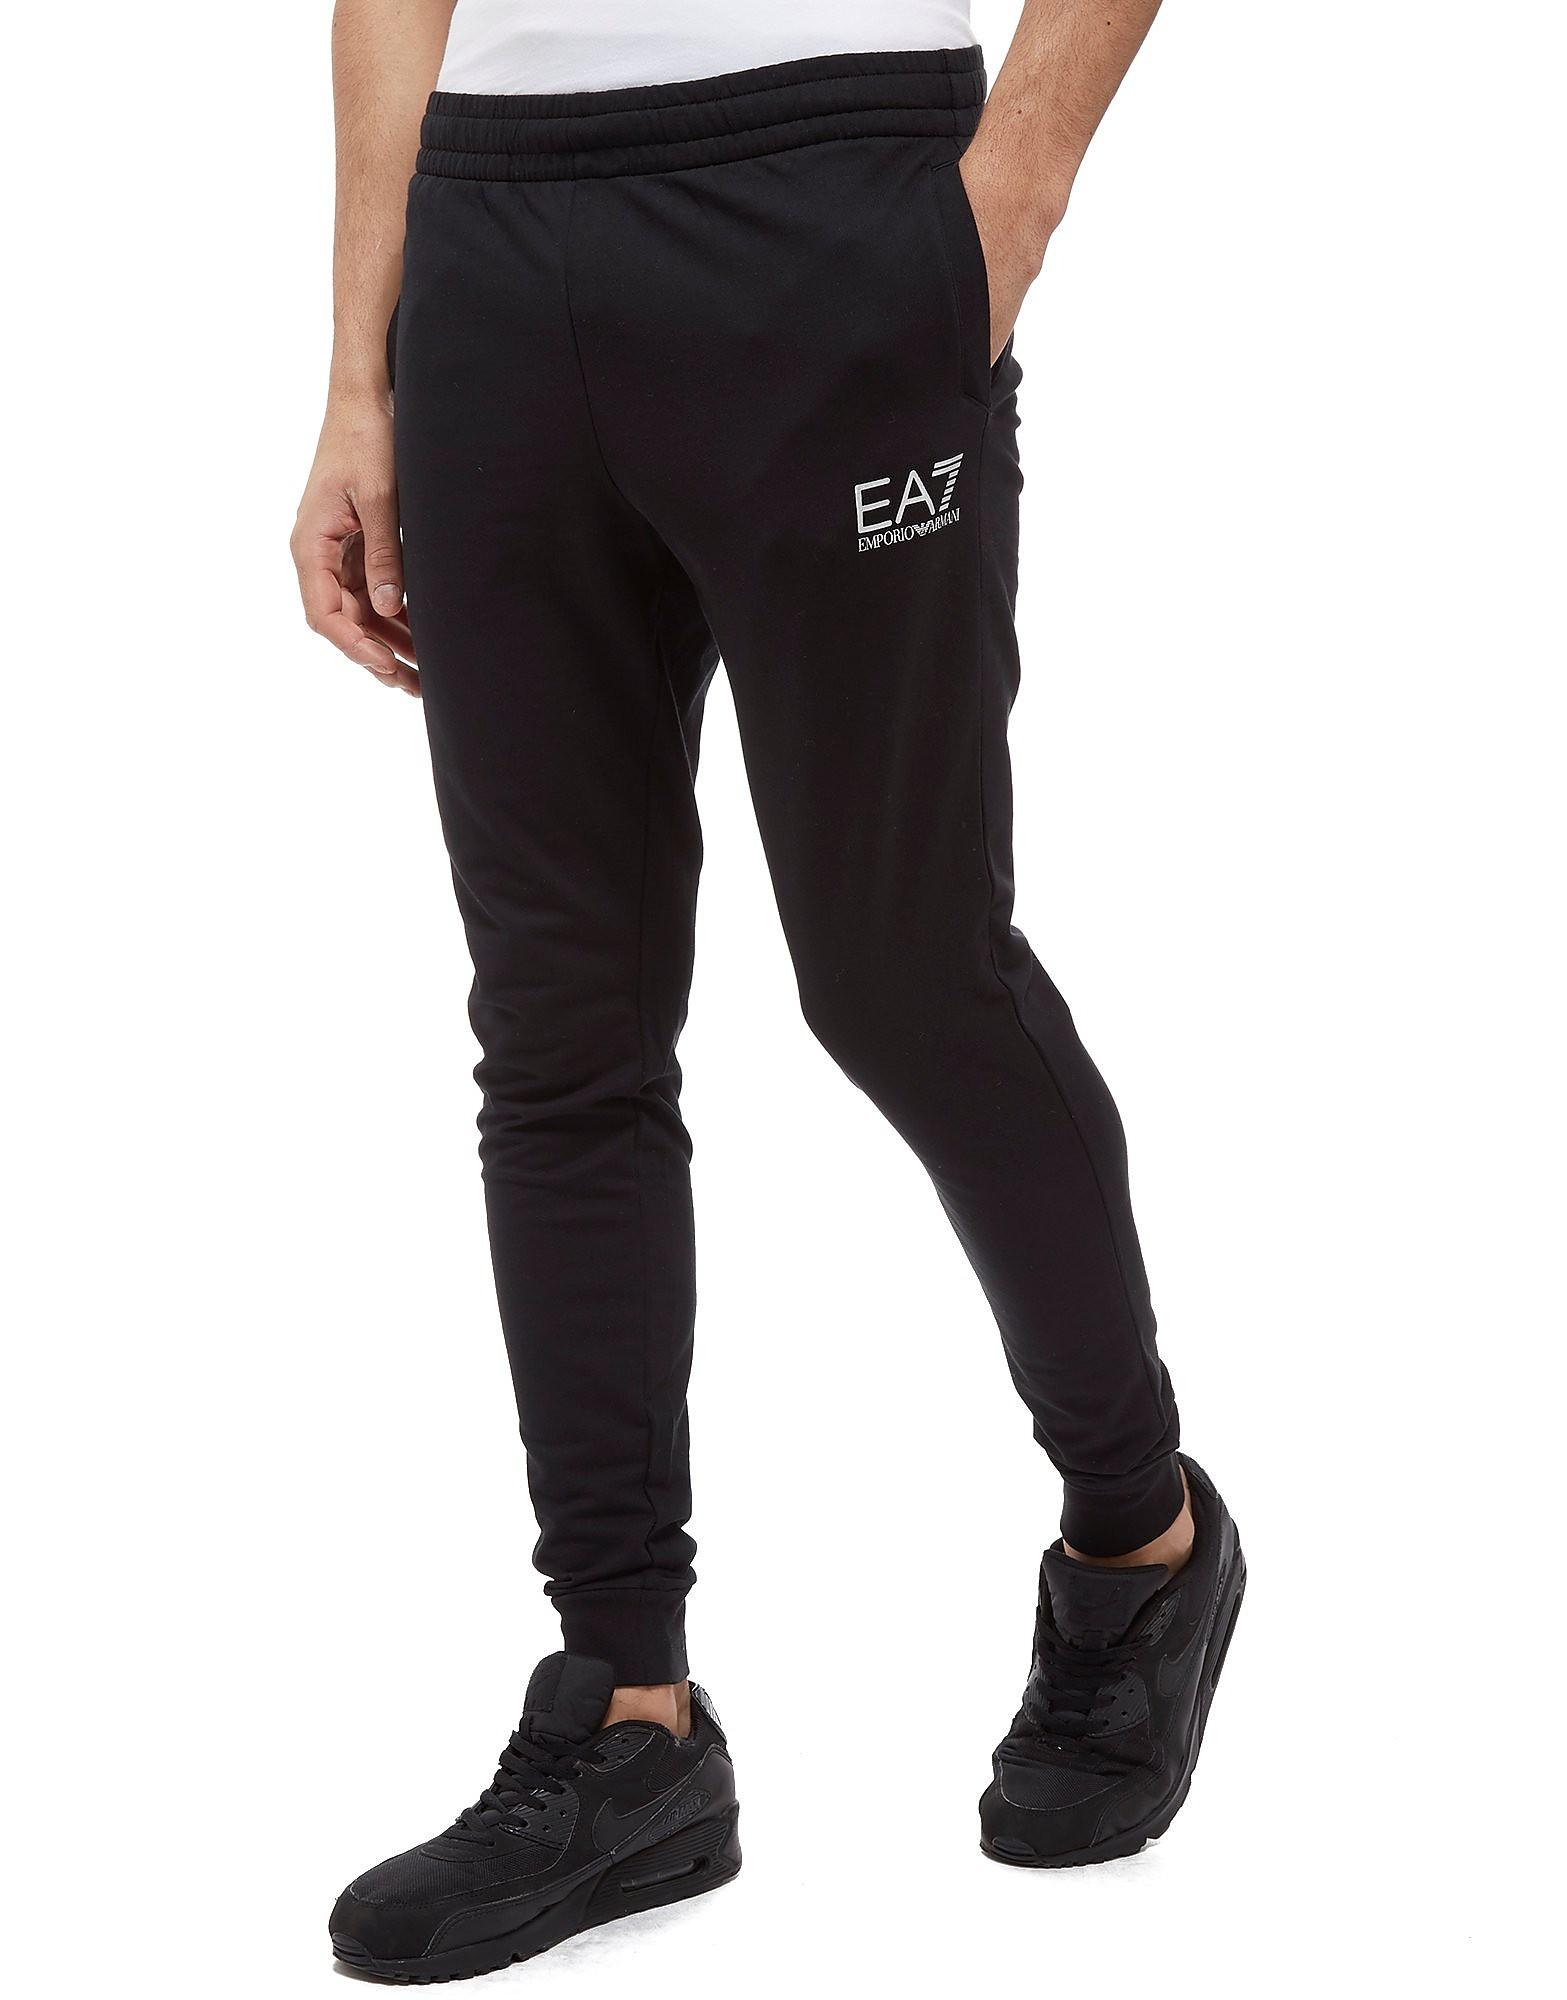 Emporio Armani EA7 Core Fleece Bukser Herre